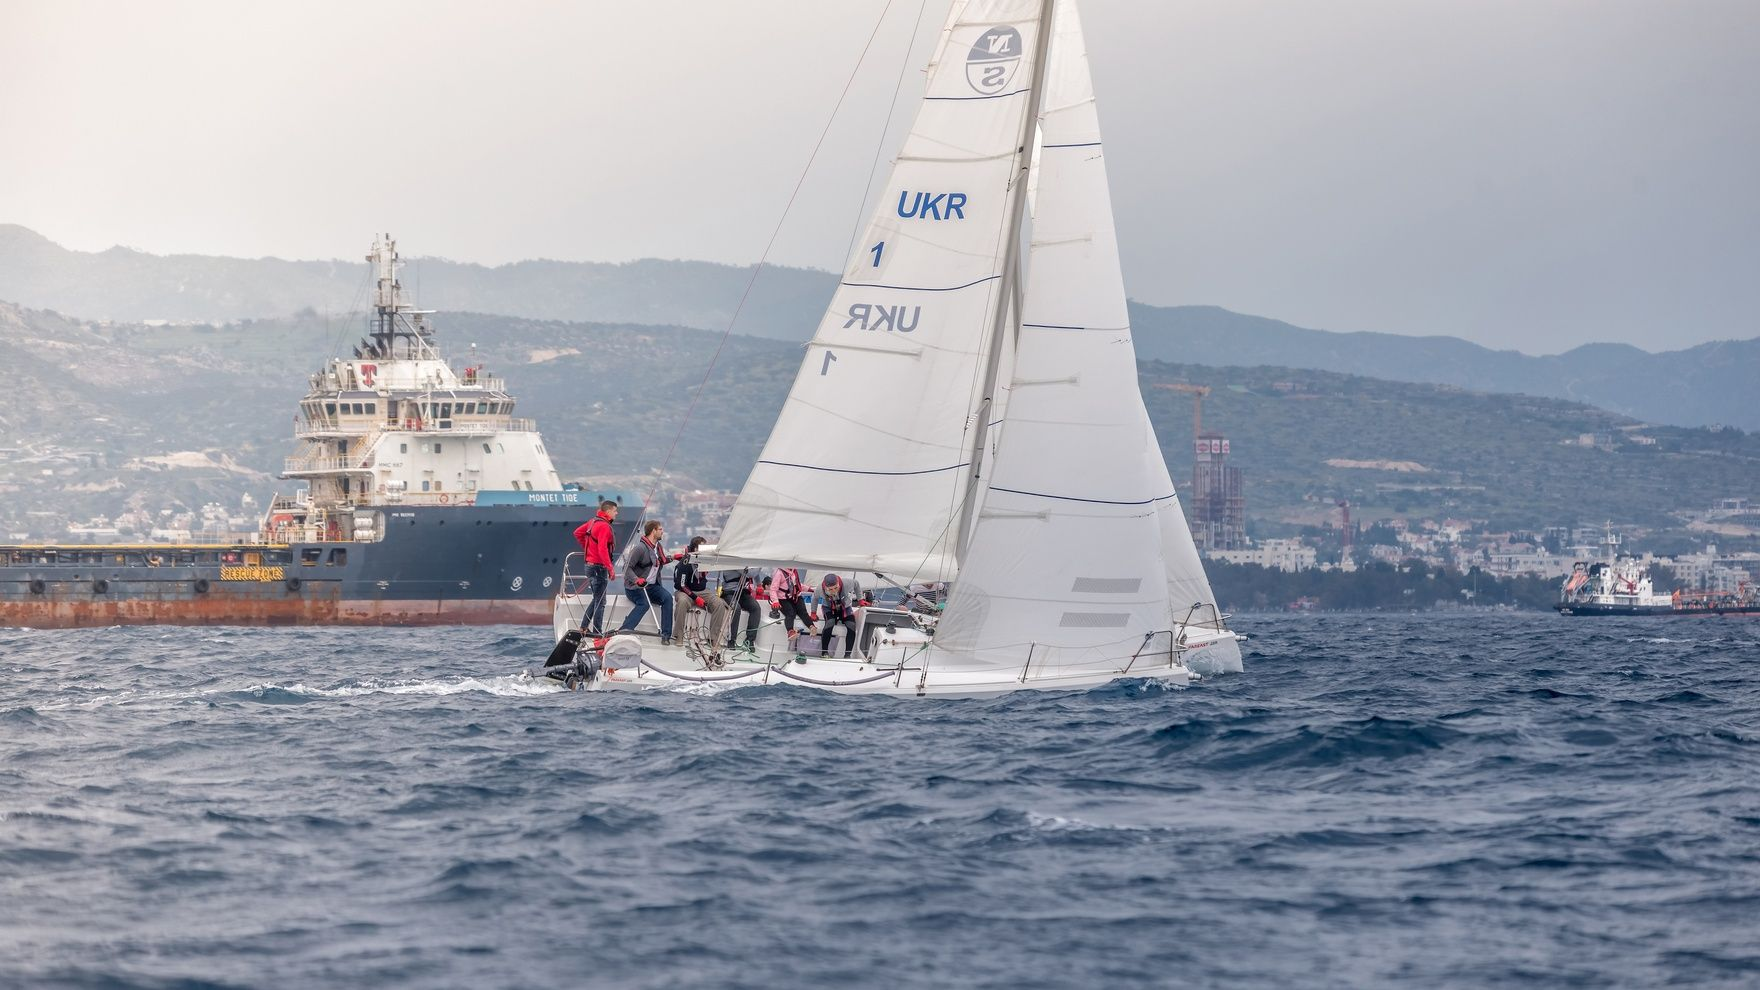 One day regatta in Cyprus